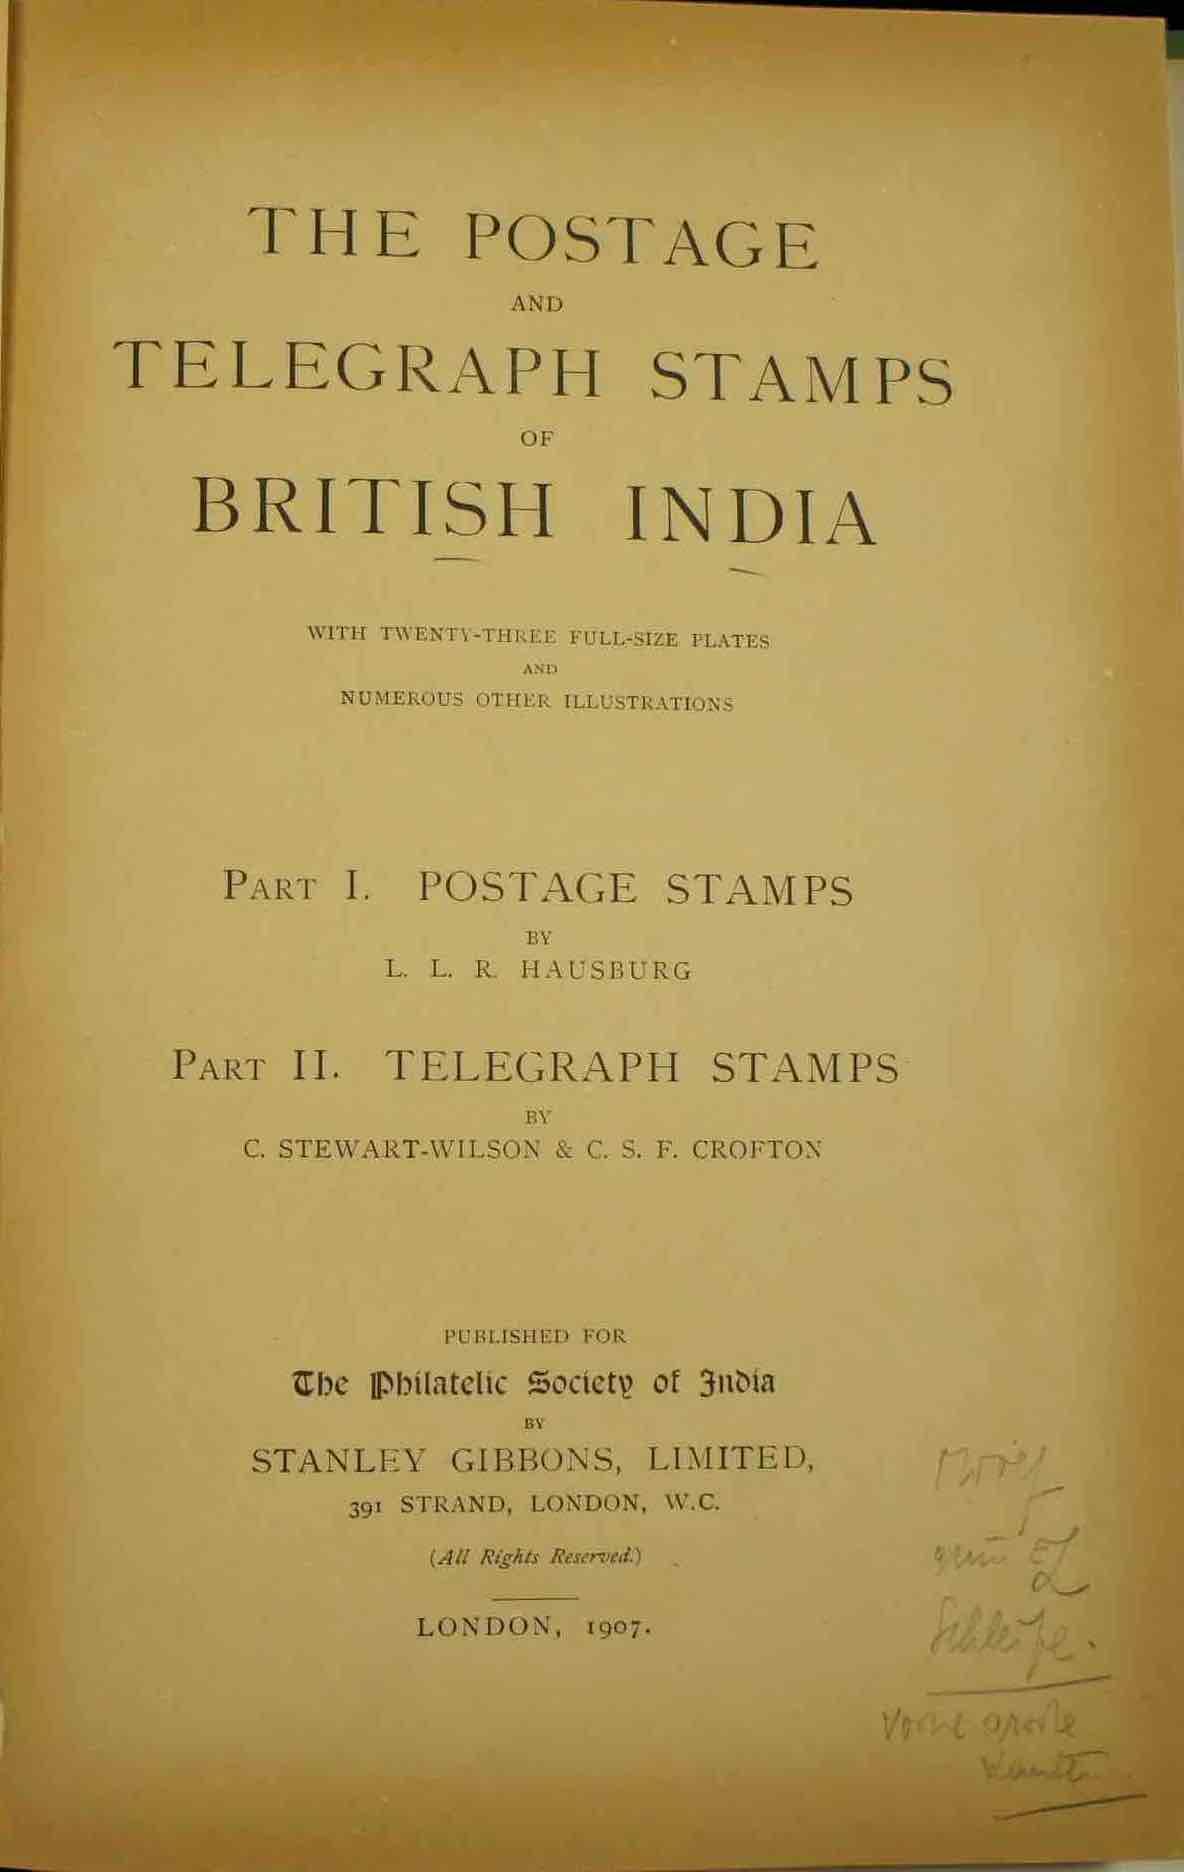 Classics Postage Telegraph Stamps British India Hausberg Title